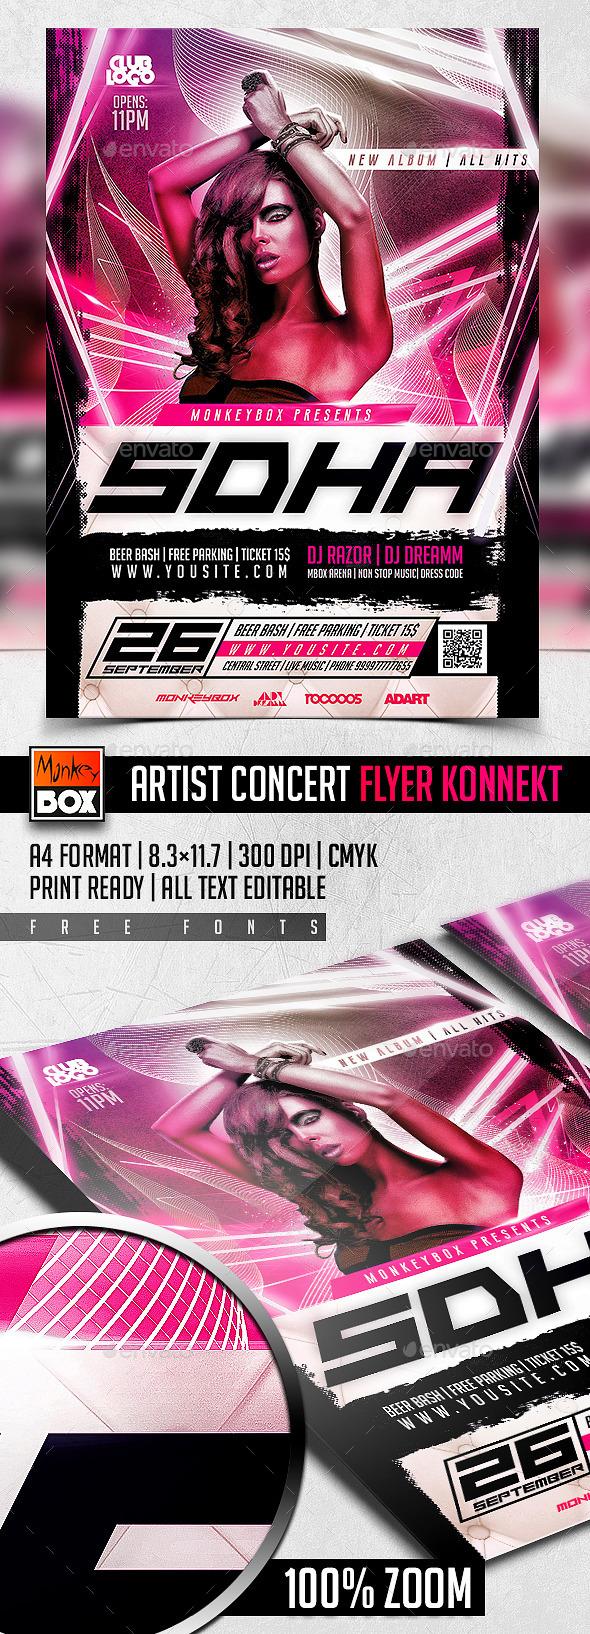 Artist Concert Flyer Konnekt - Flyers Print Templates